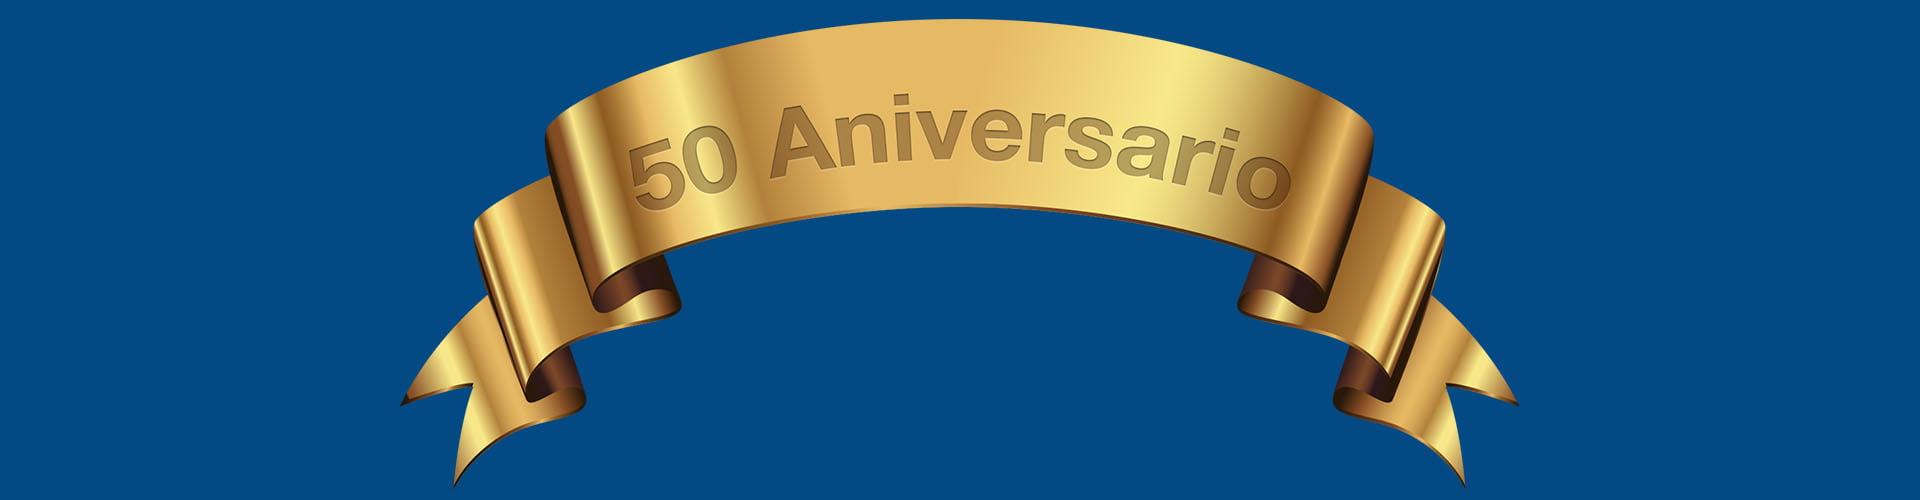 50 Aniversario UCB Cochabamba